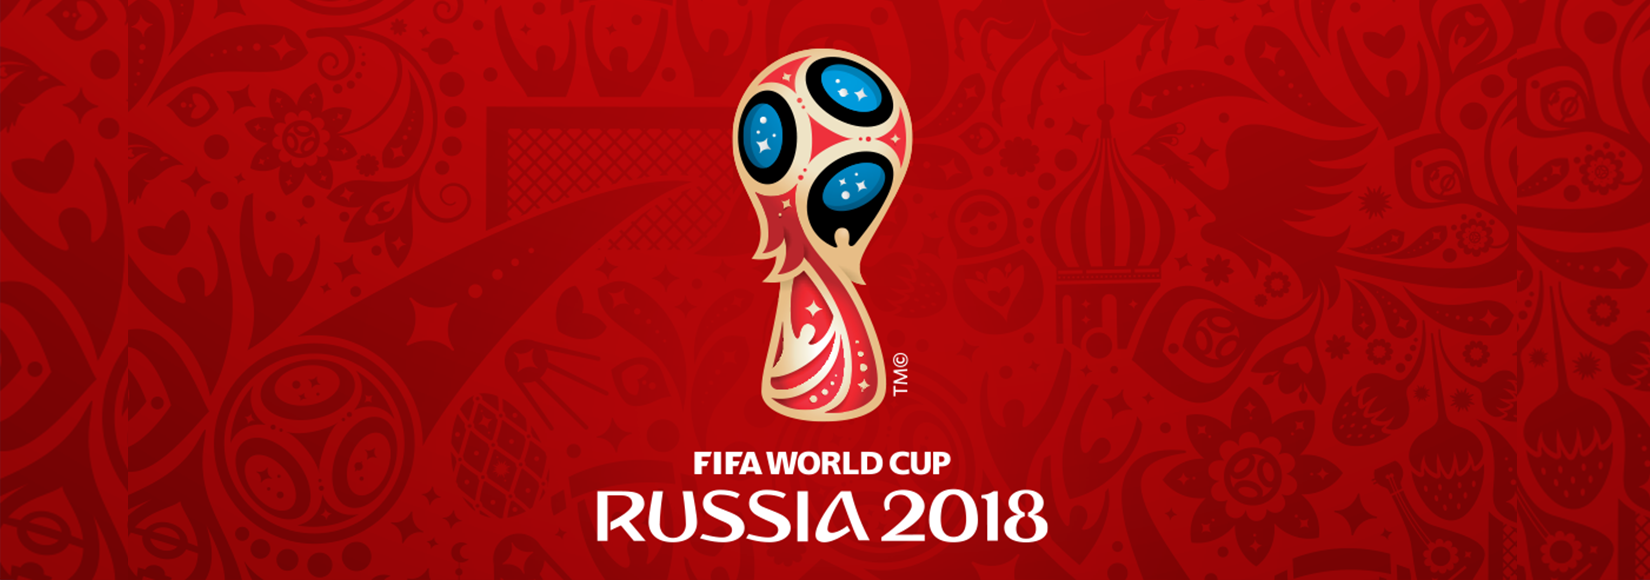 FIFA World Cup Russia 2018 دانلود مسابقات جام جهانی 2018 روسیه - ایرانیان دانلود